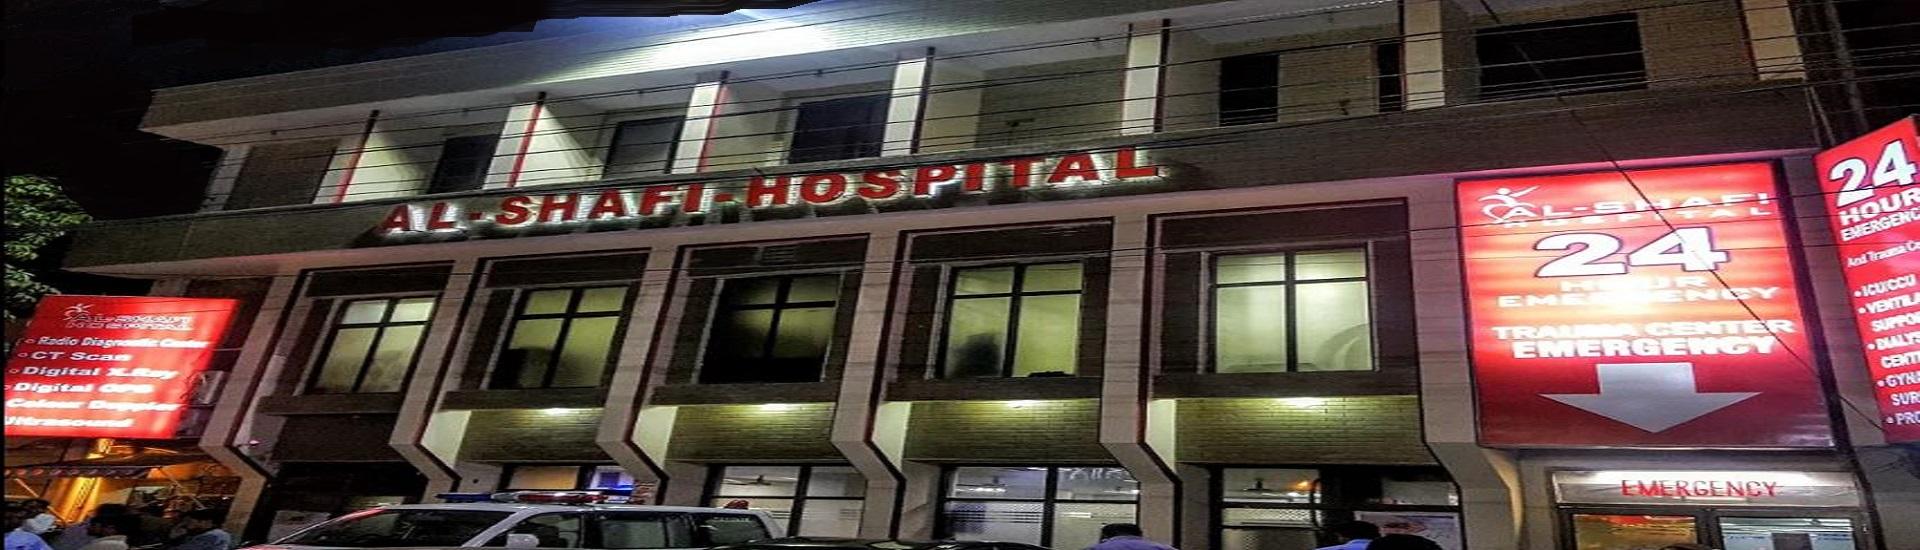 Al shafi hospital front